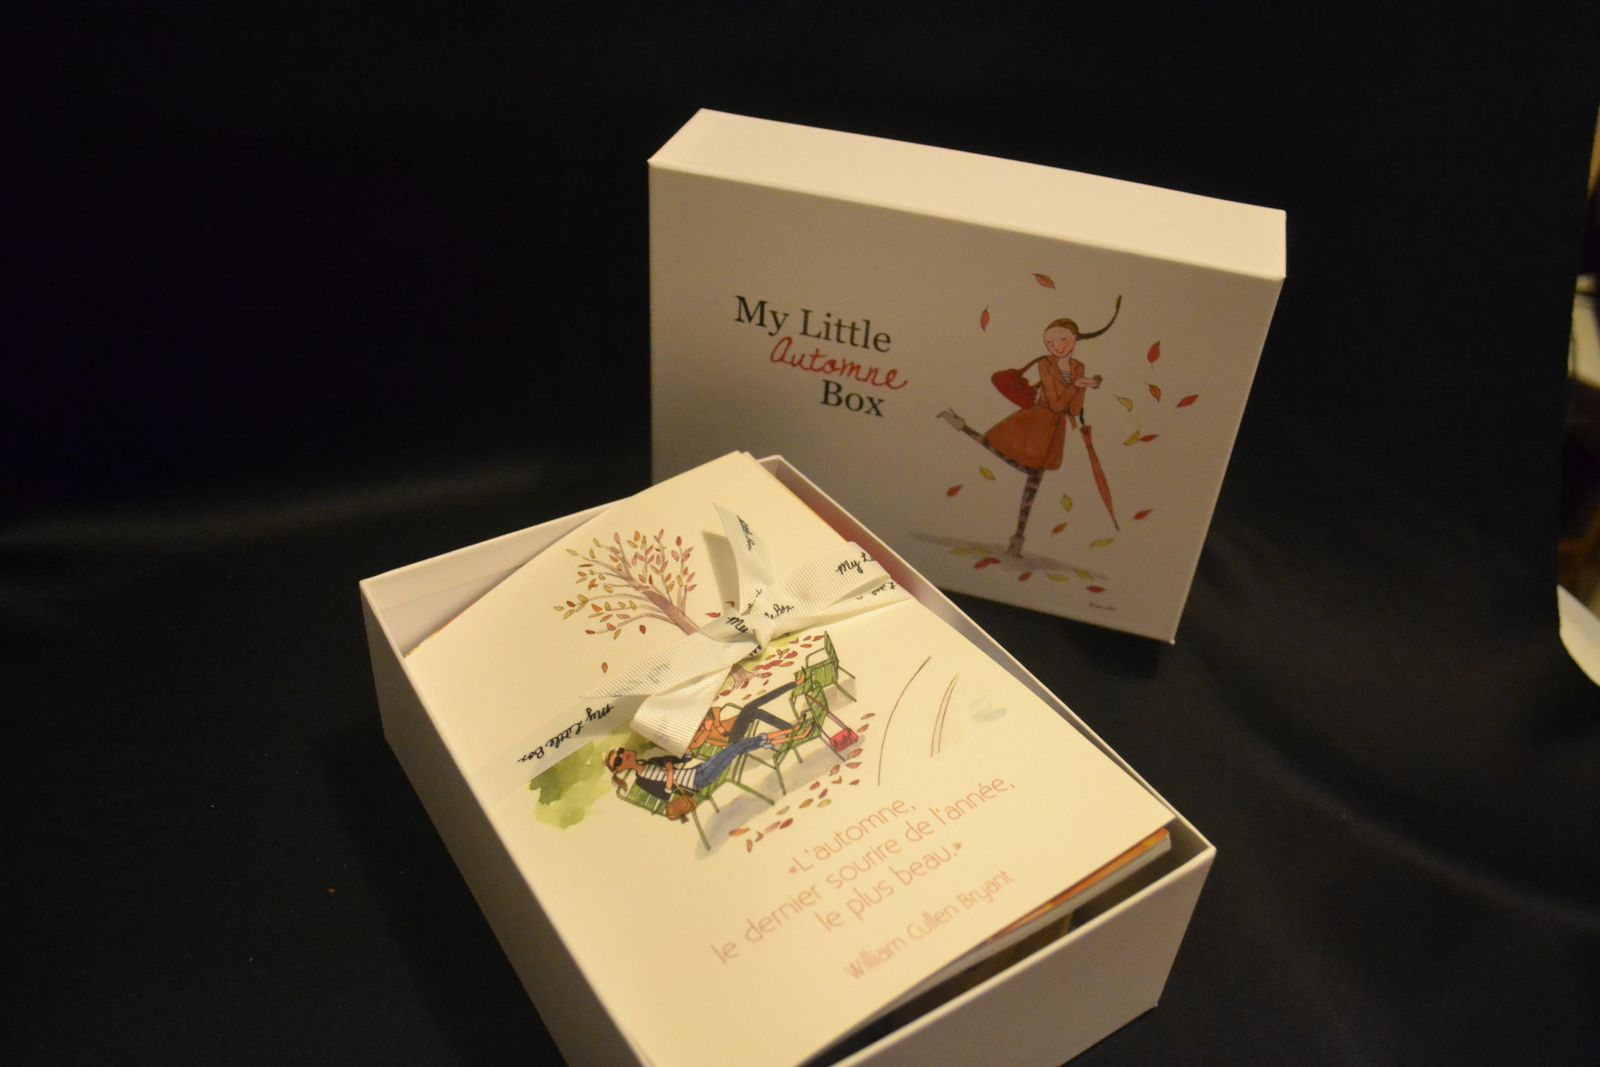 Box: My Little Box